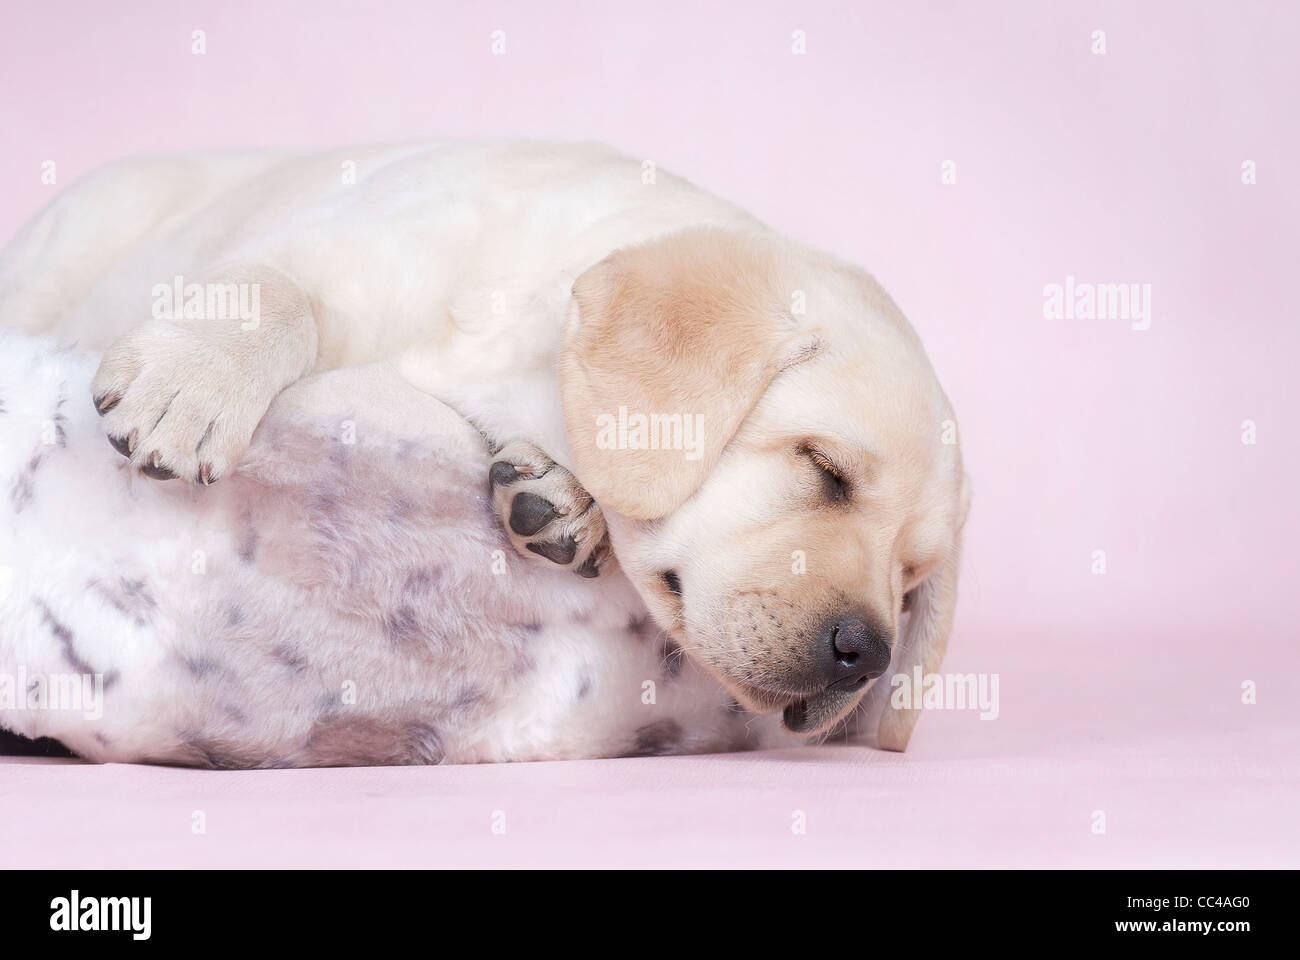 Sleeping labrador puppy at pink background - Stock Image